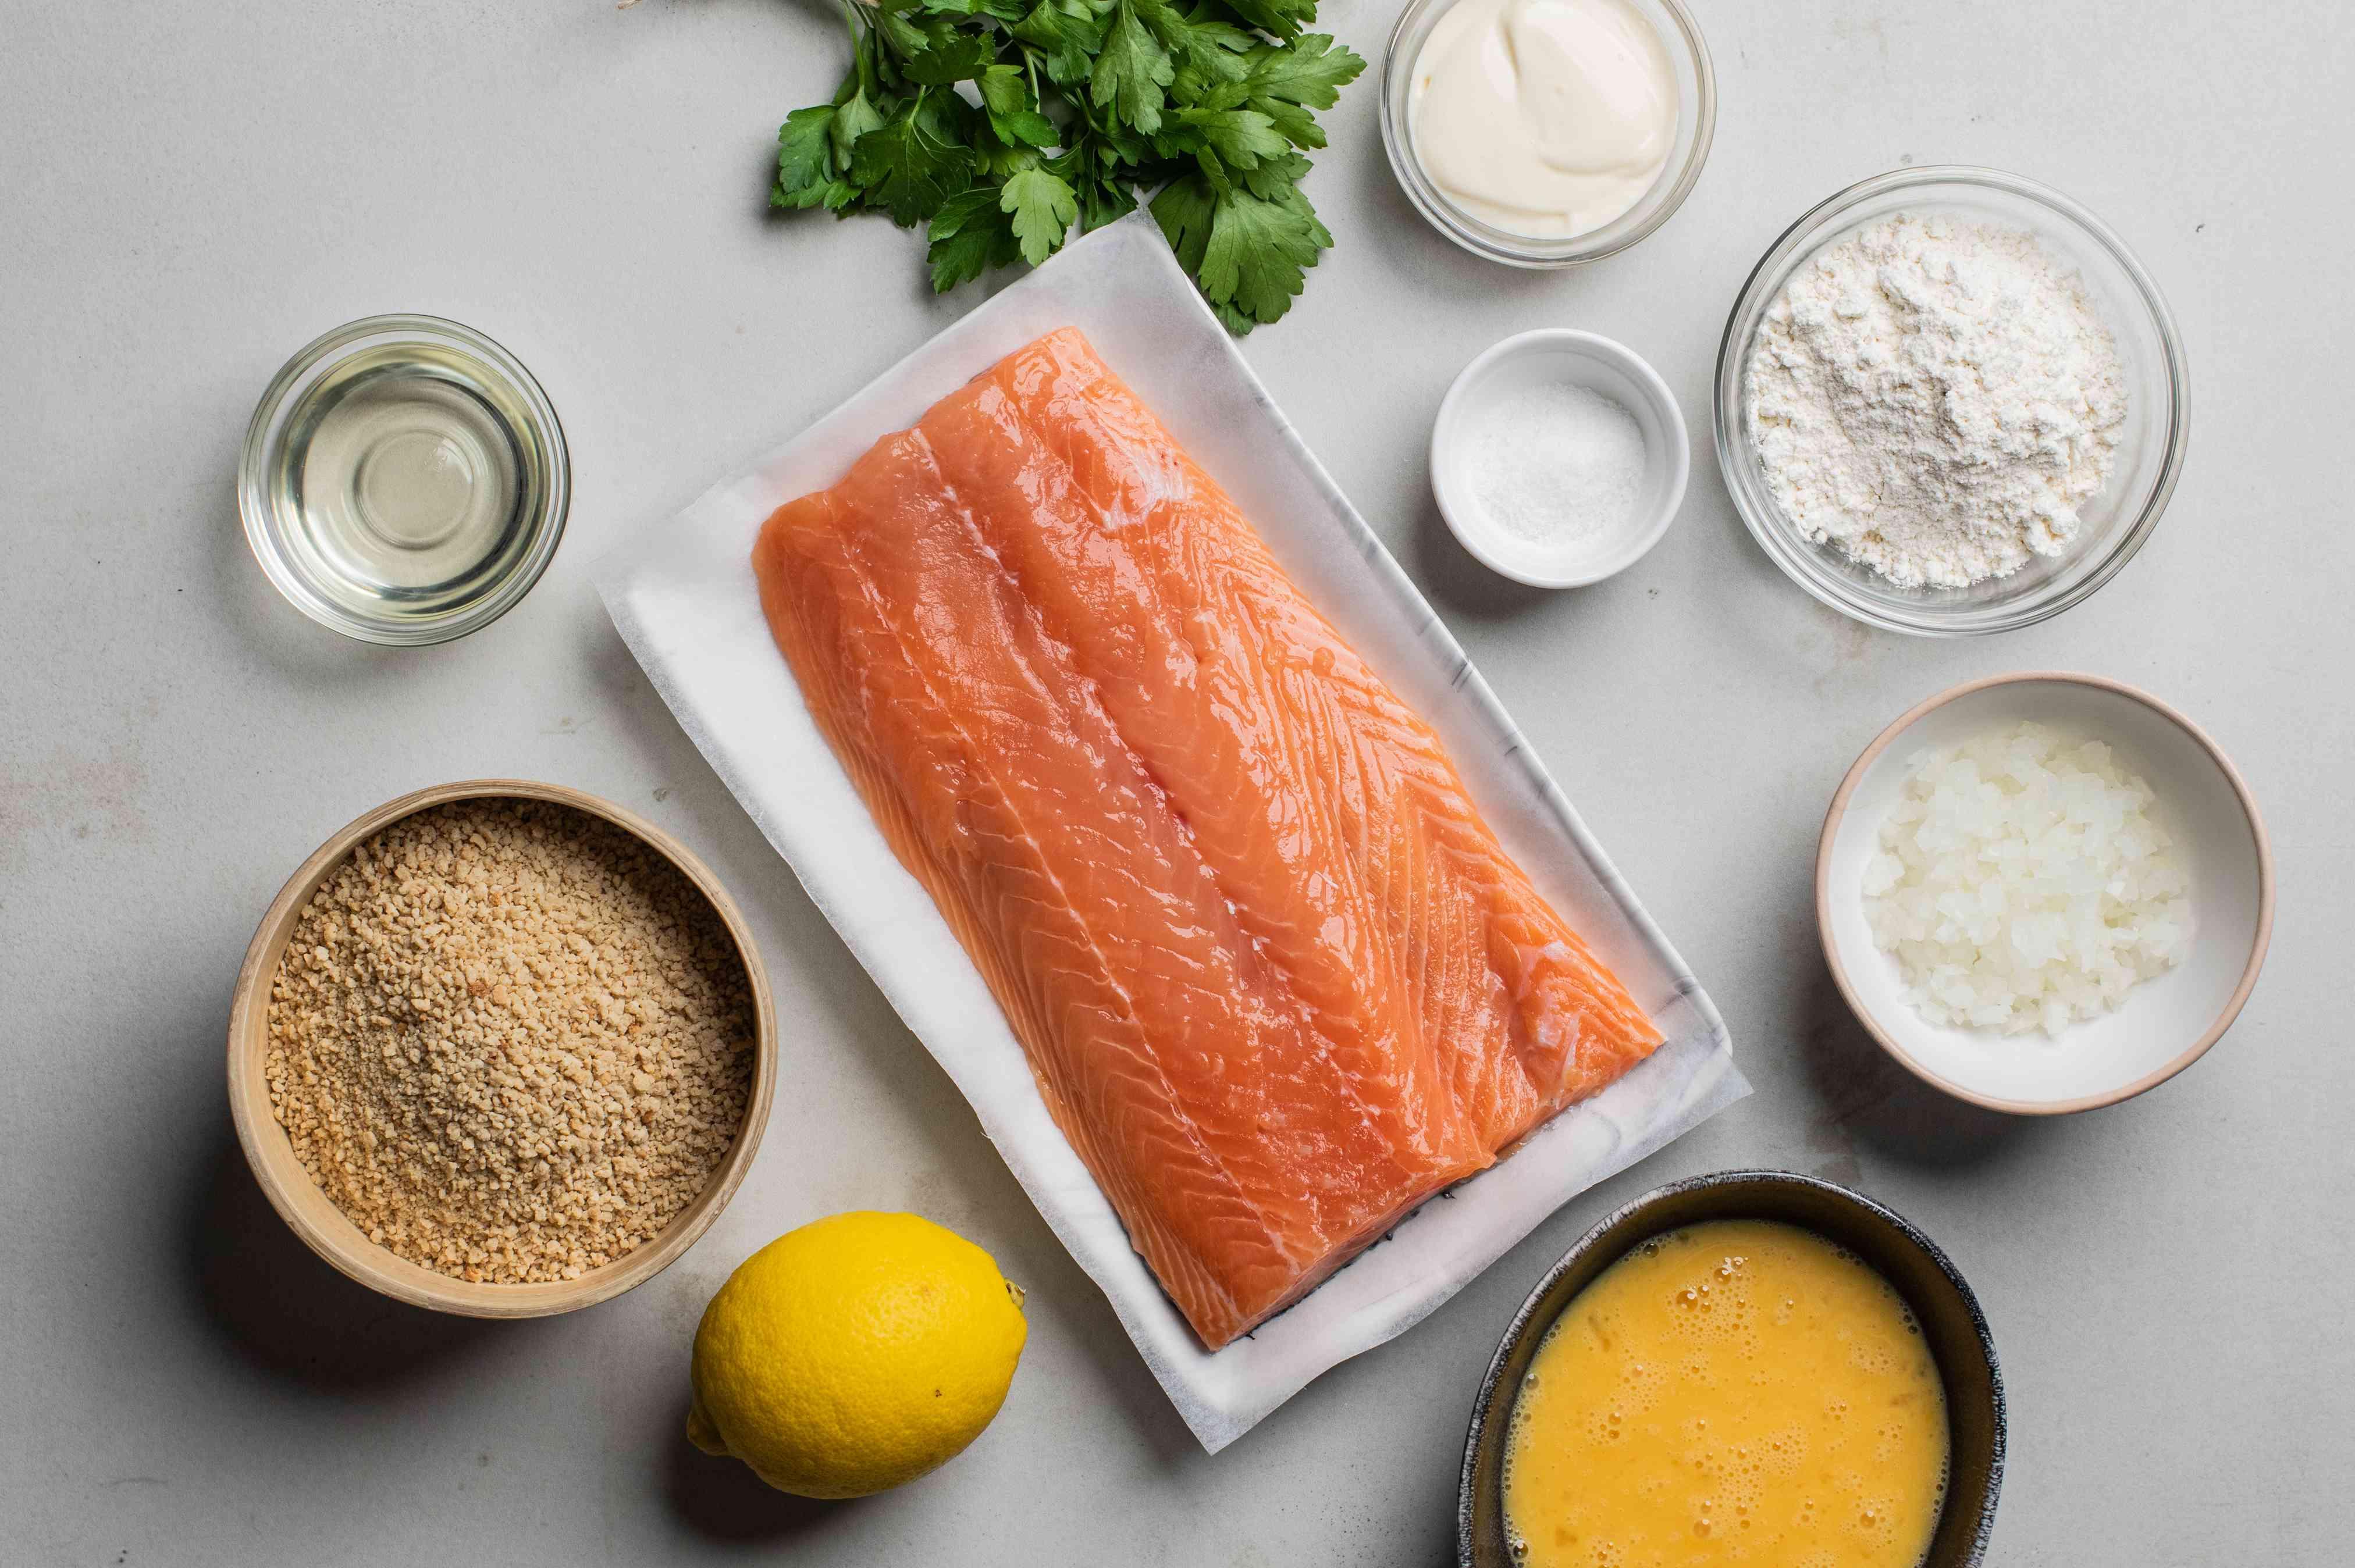 Ingredients for salmon patties